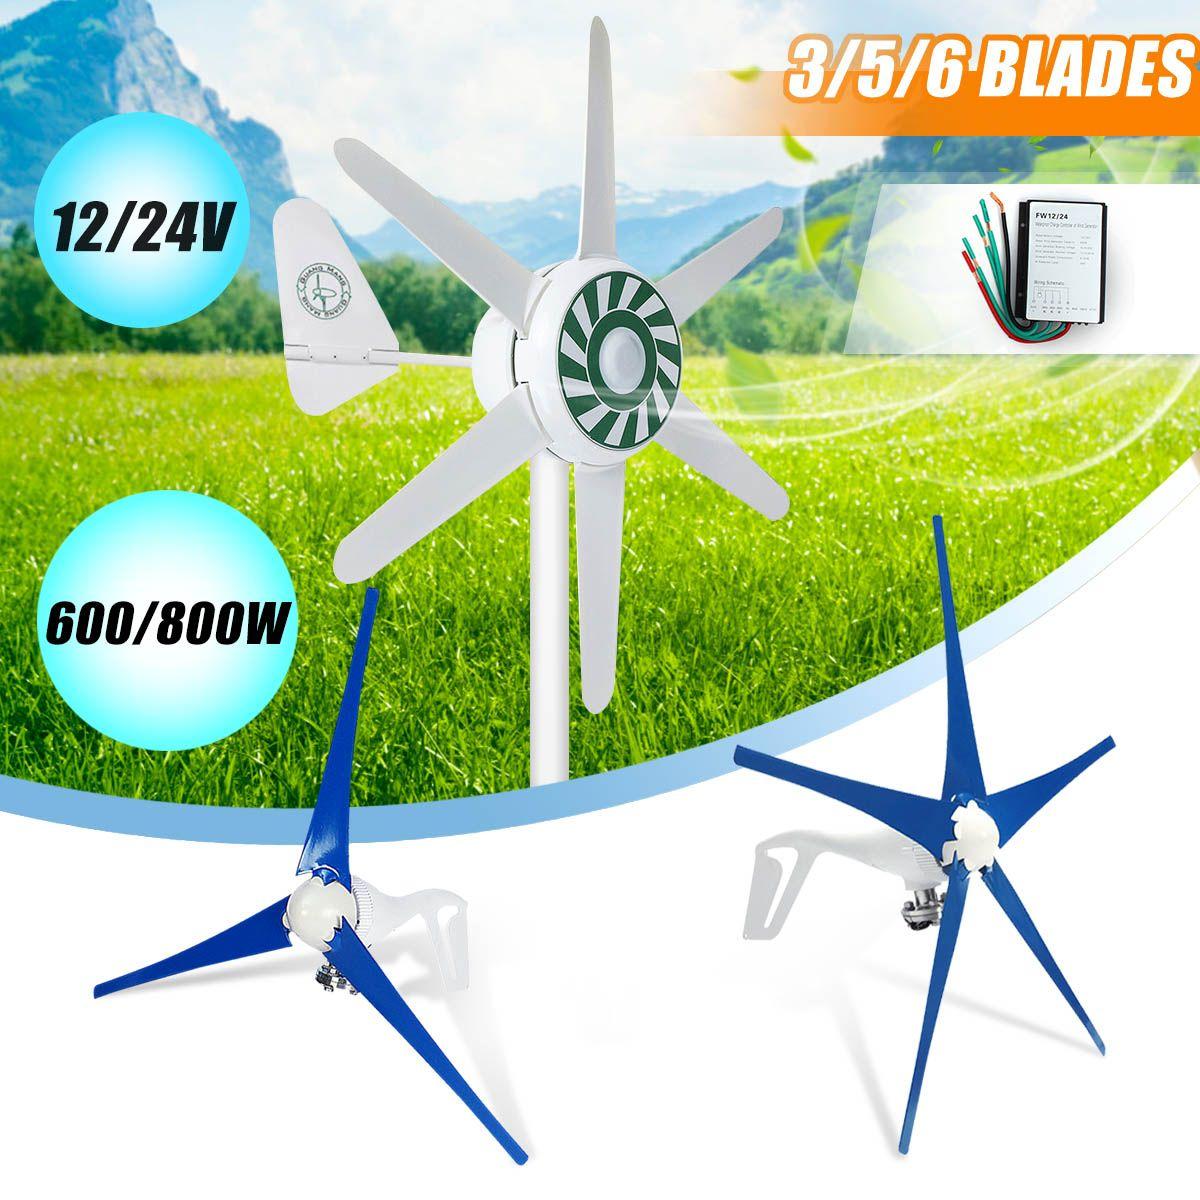 600/800 W 12/24 V 3/5/6 Nylon Faser Klinge Horizontale Hause Wind für turbine Wind Generator Power Windmühle Energie für Turbine Ladung